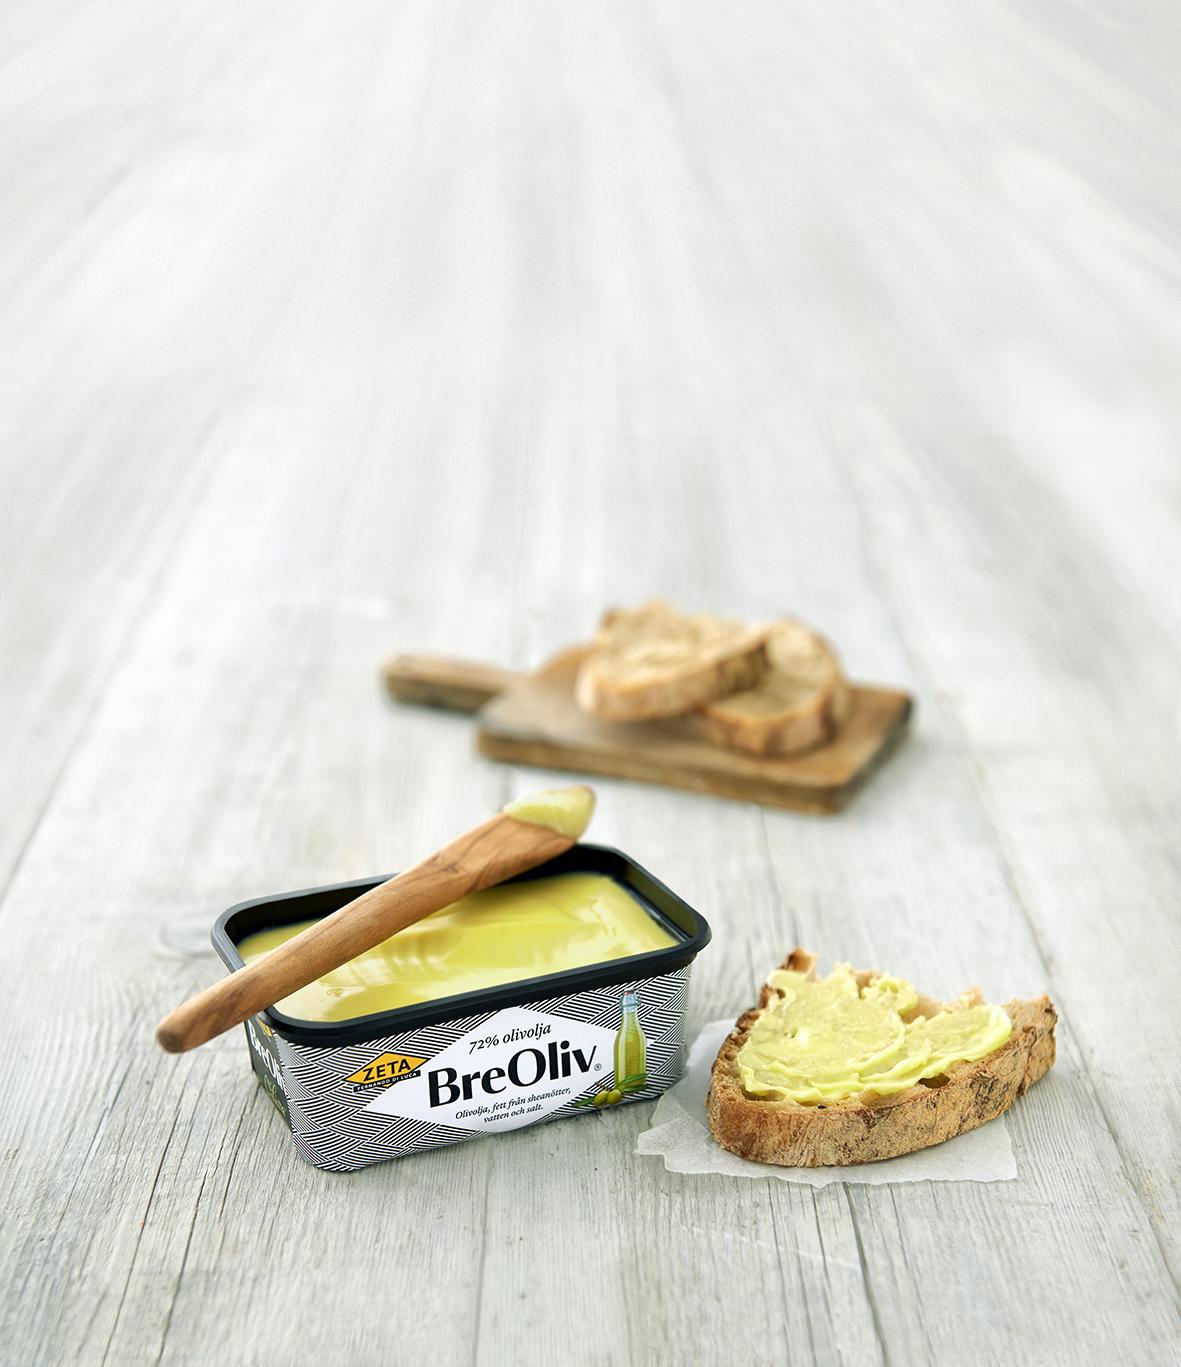 kan man steka i olivolja